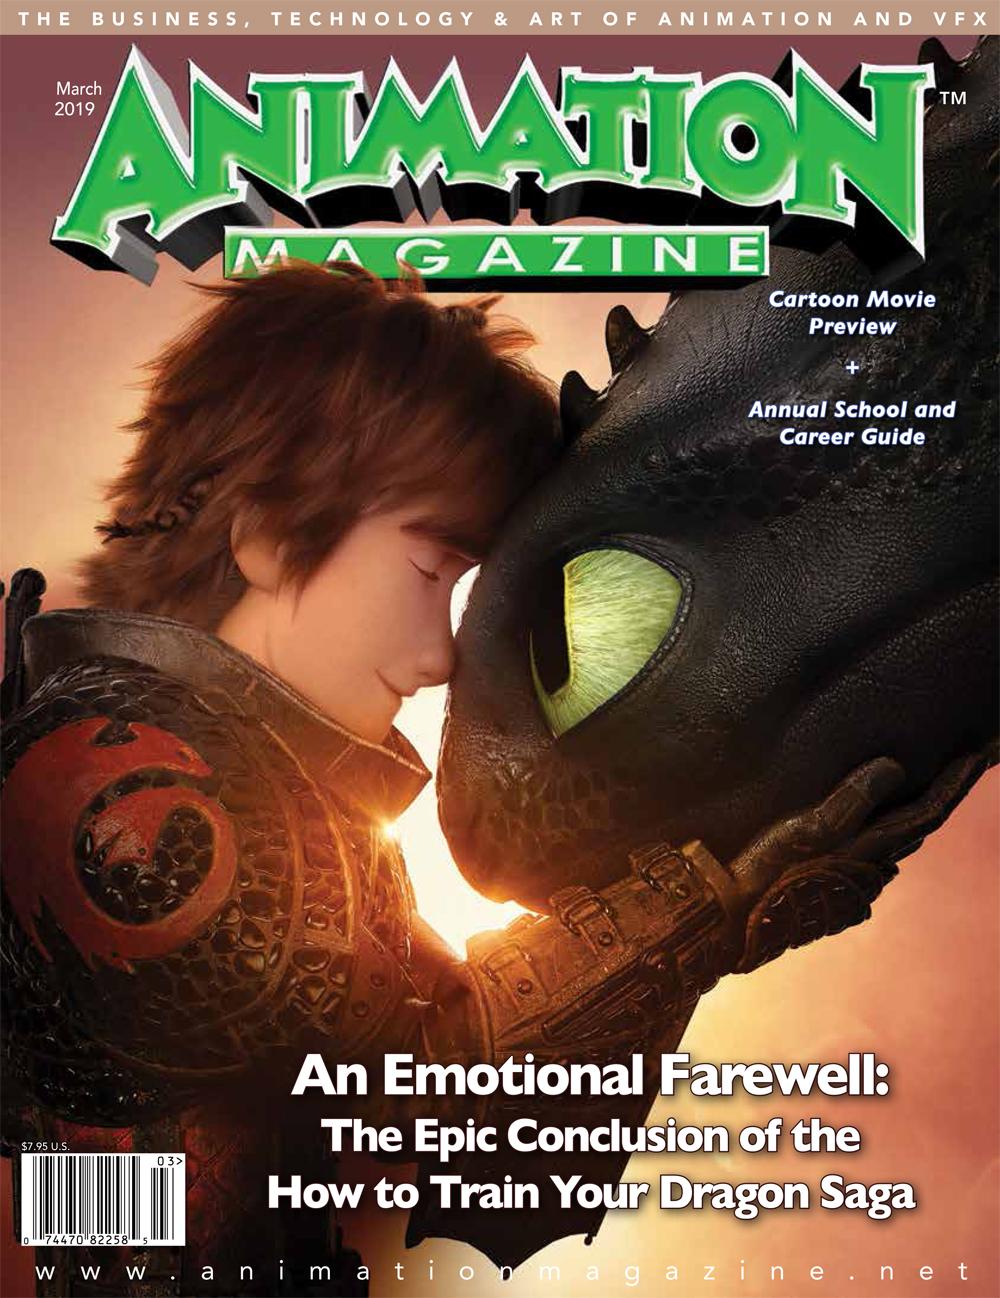 Animation Magazine - #288 March 2019